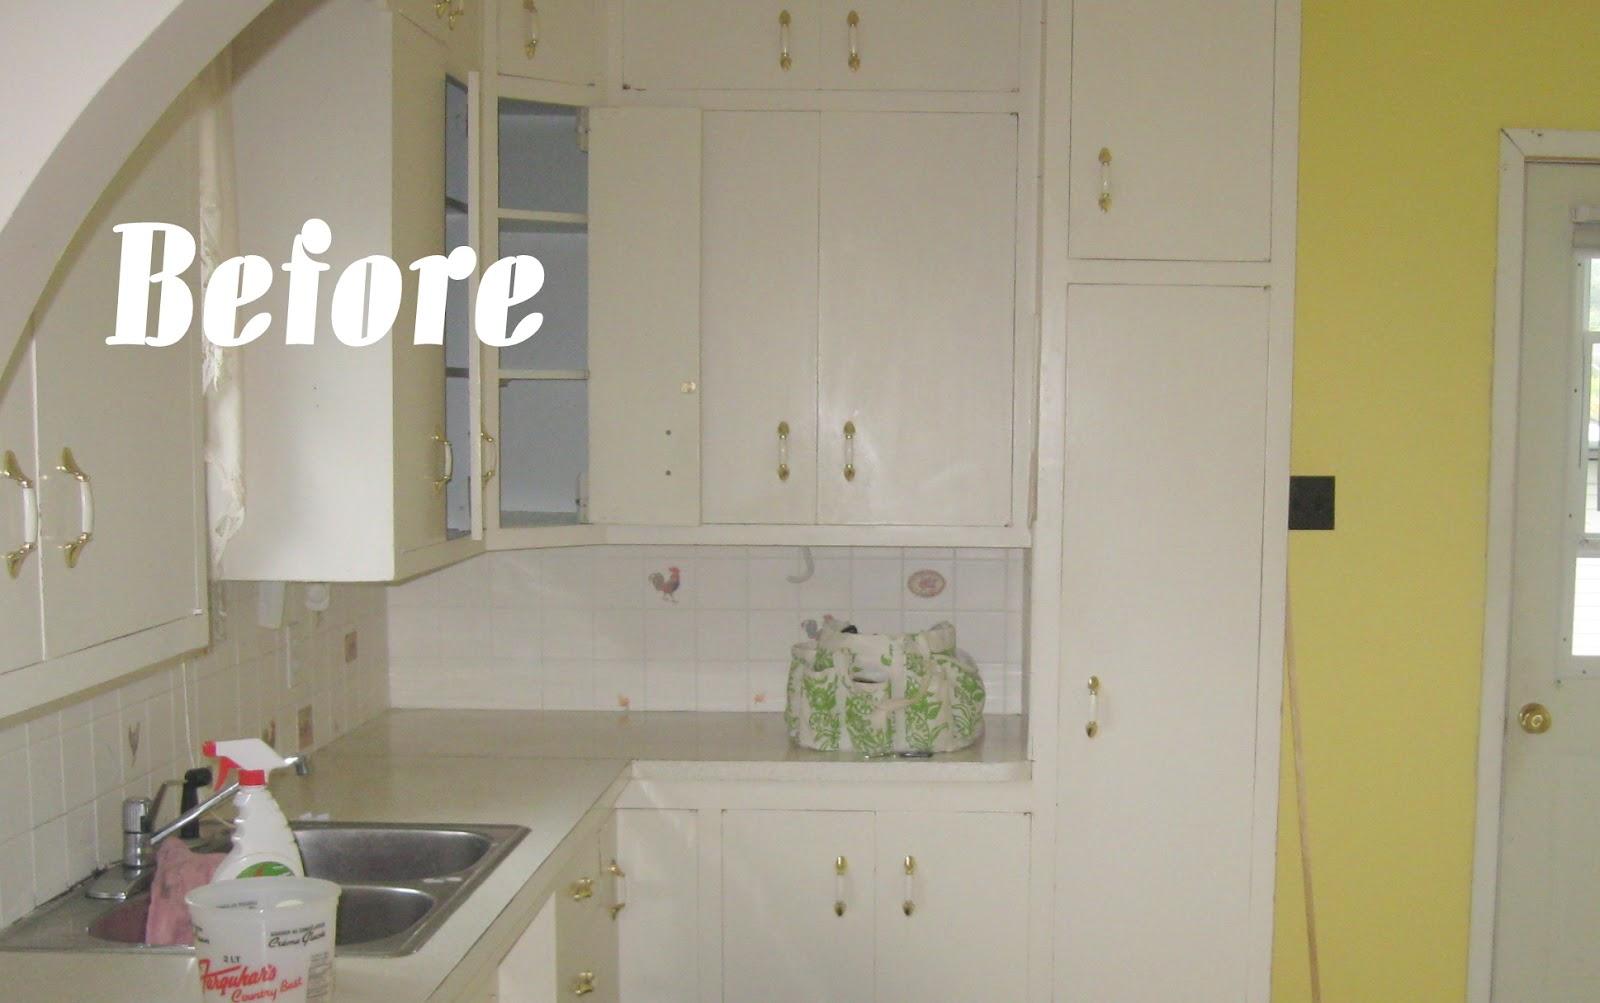 Imitation Granite Countertops Kitchen Swamp Hollow Designs My 40 Faux Granite Countertops Tutorial